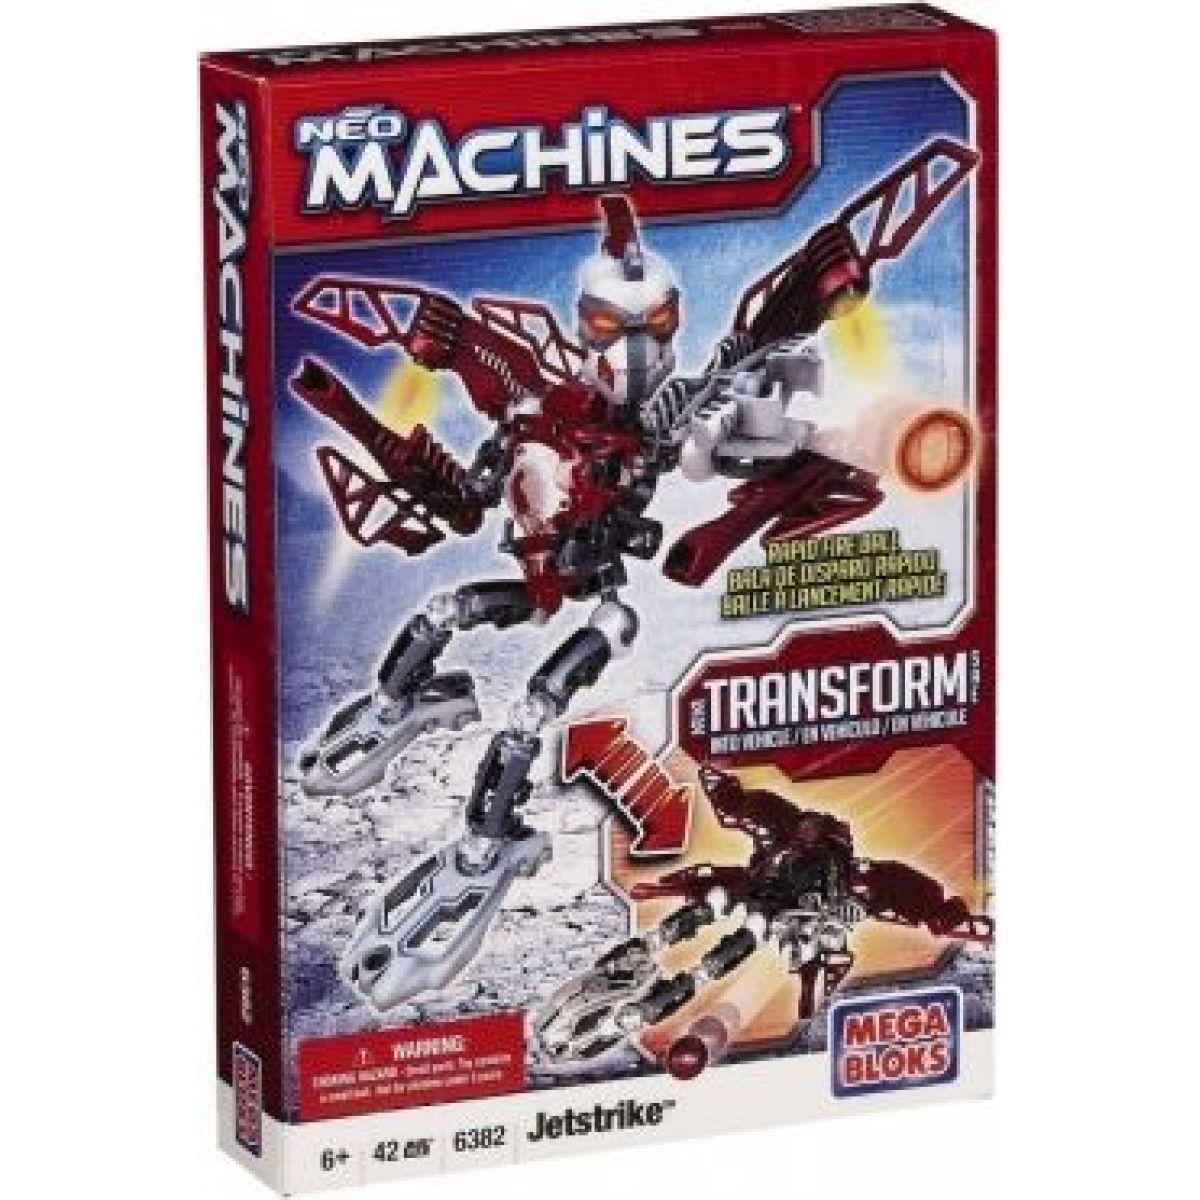 Mega Bloks 6382 Neo Machines Rapid Attack Jetstrike